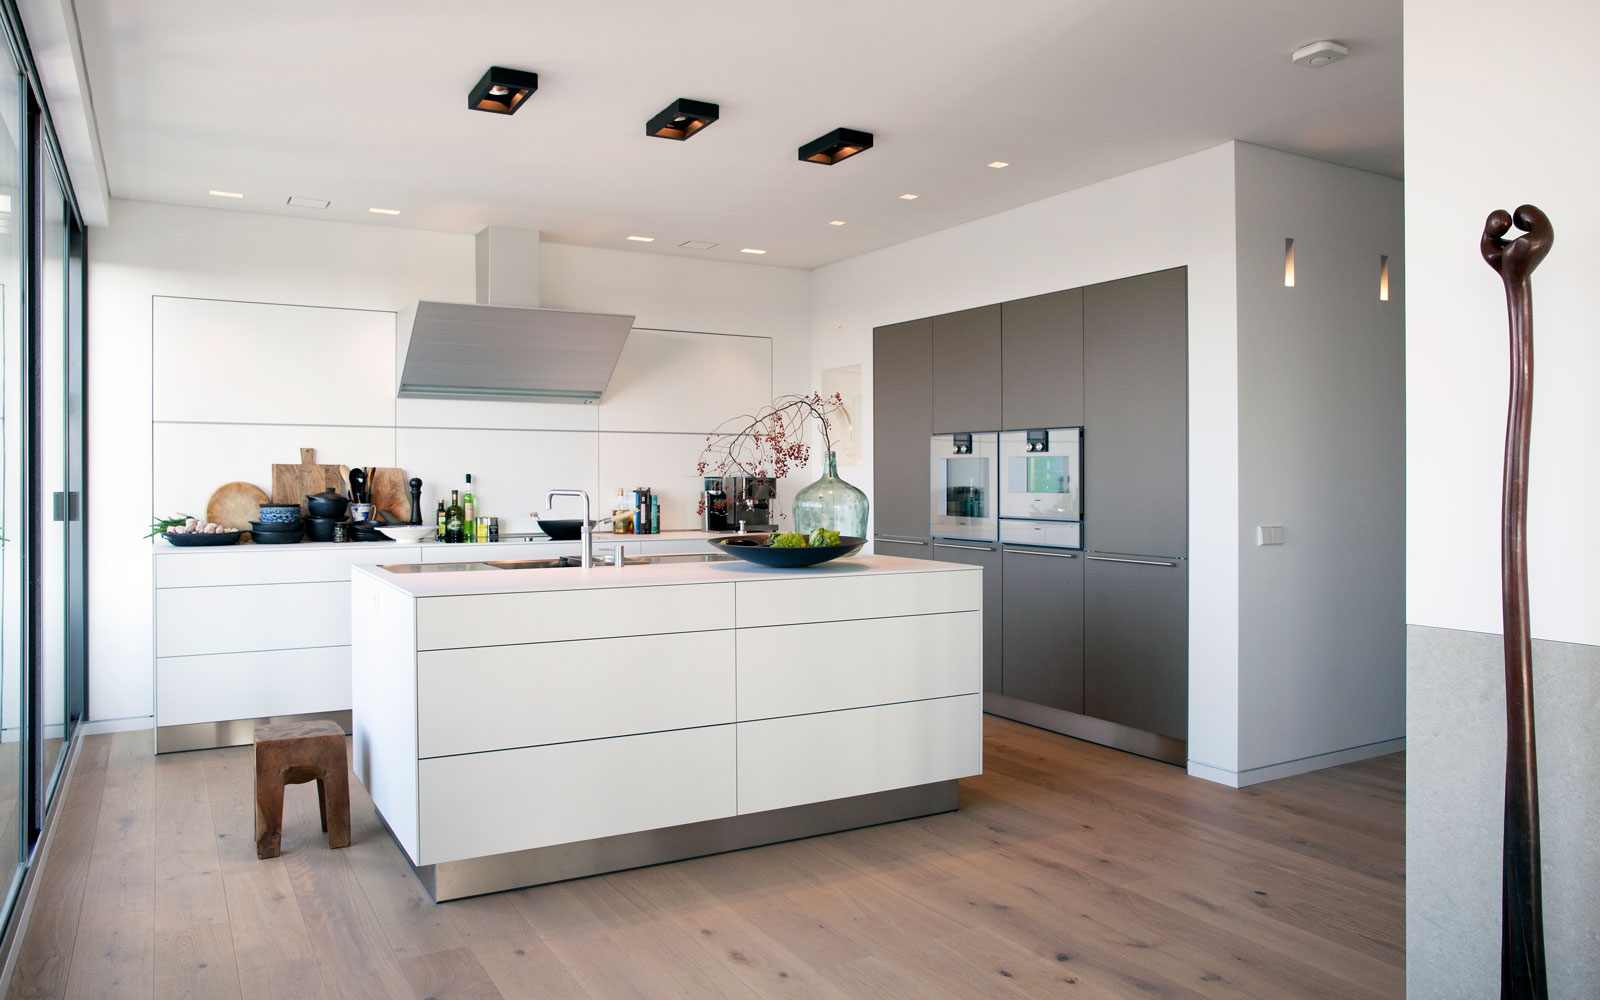 Strakke witte keuken door Bulthaup Leiden Keukenarchitectuur, rvs plinten, zwevende keuken, Penthouse Den Haag, Marco van Zal